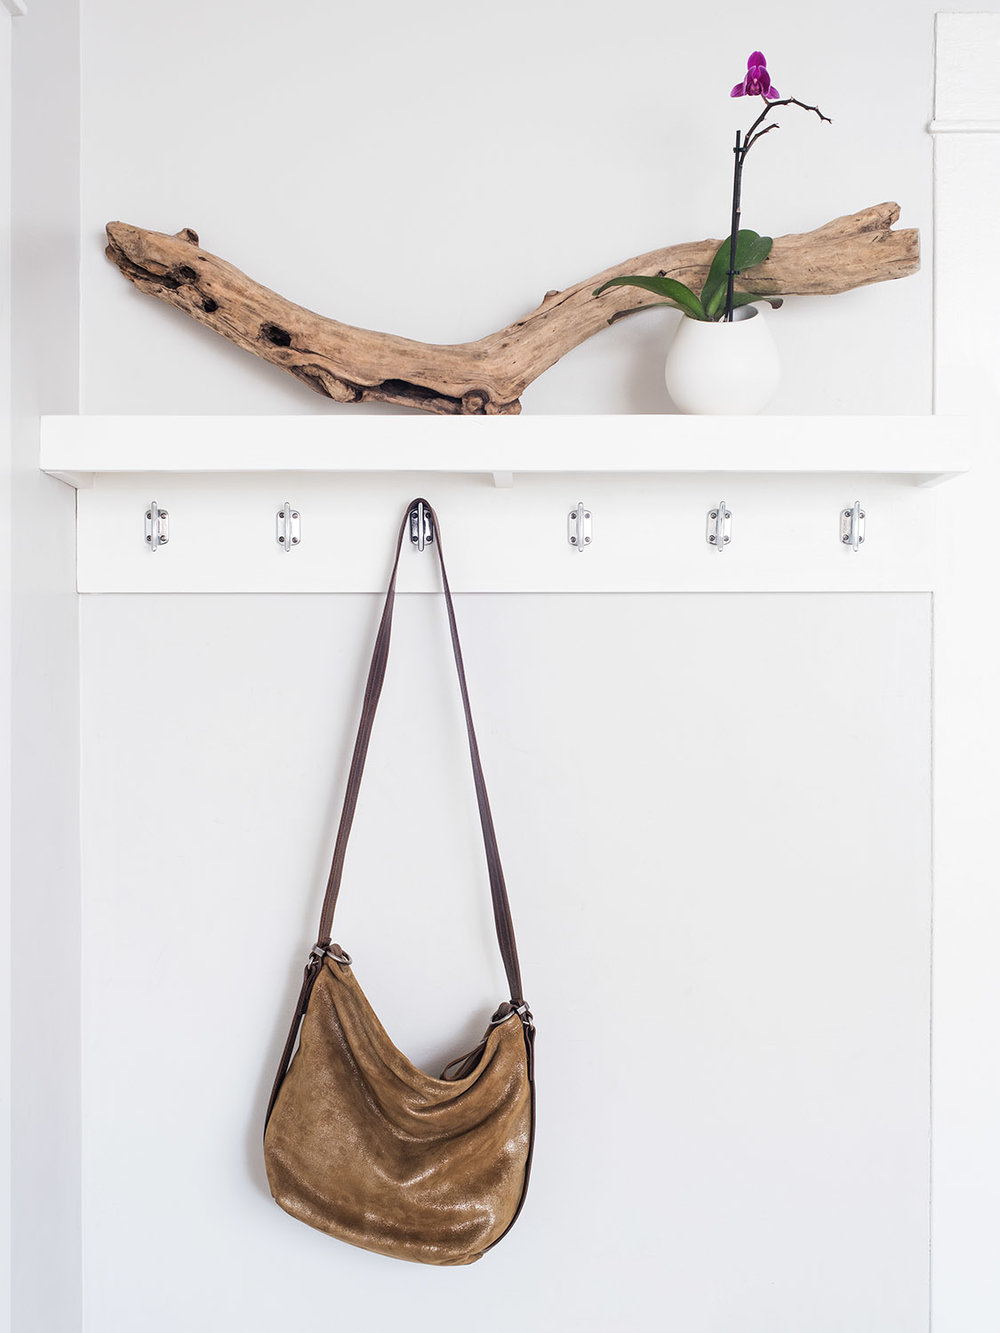 Driftwood2.jpg